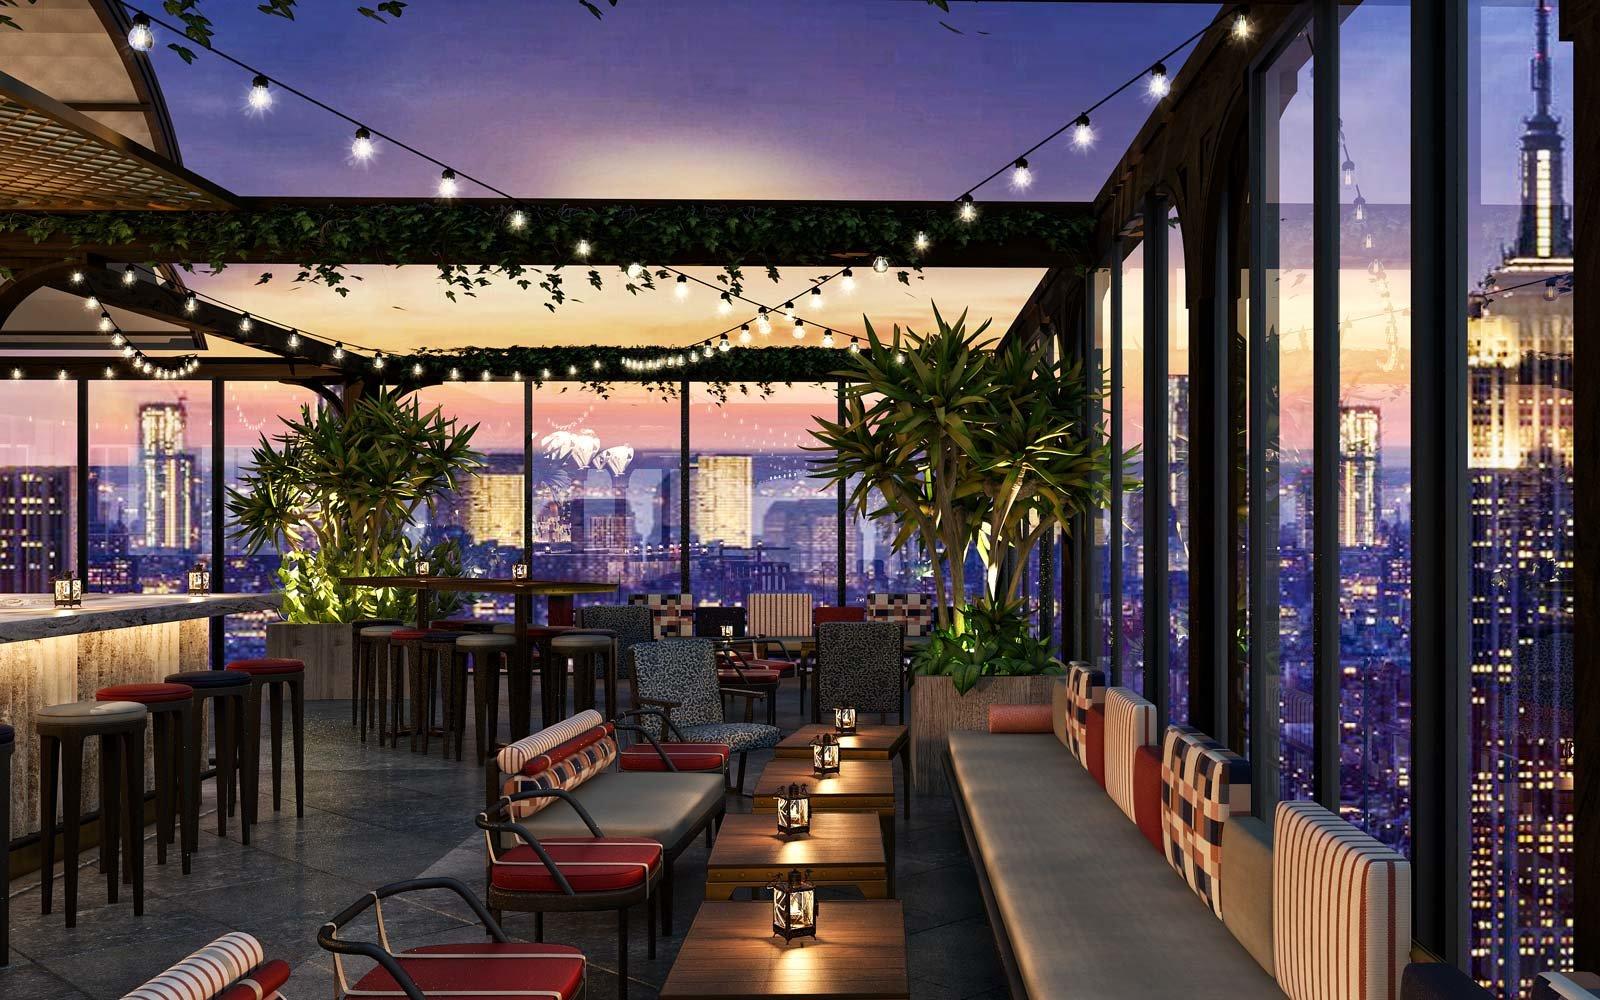 moxy-hotel-rooftop-bar-new-york-city-skyline-NYCROOF0617.jpg